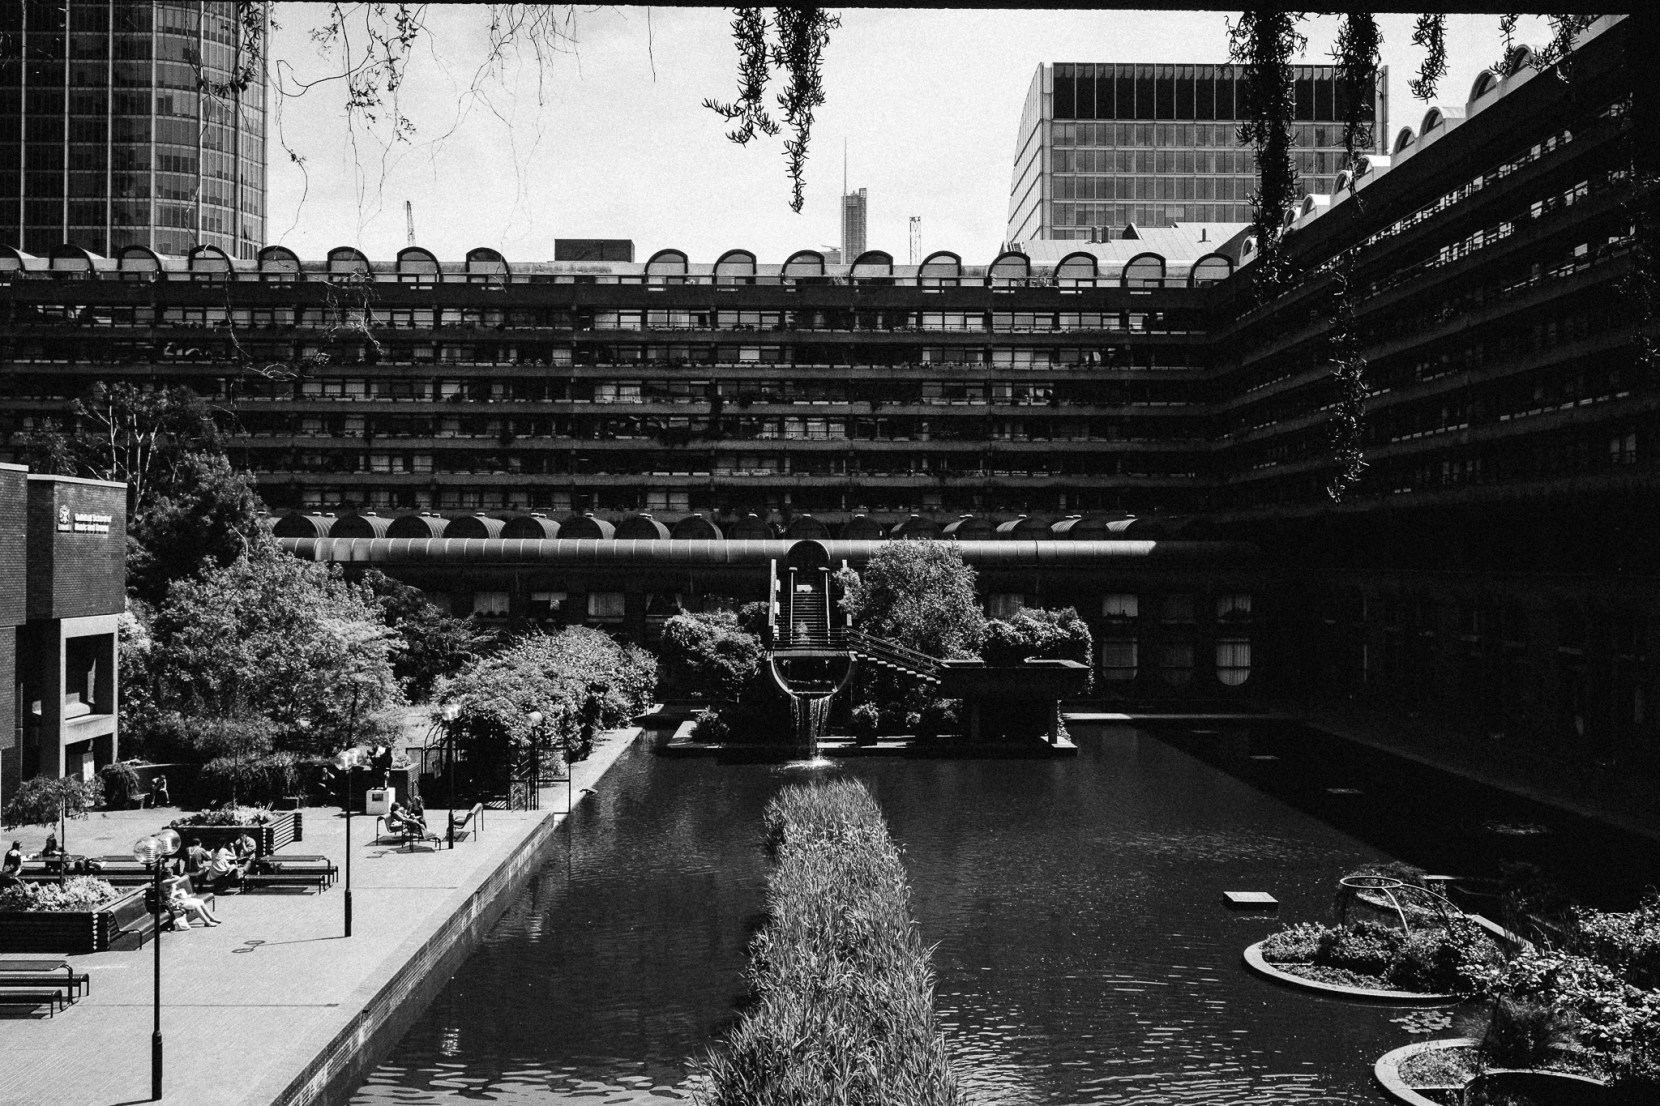 london-barbican-2073-pete-carr